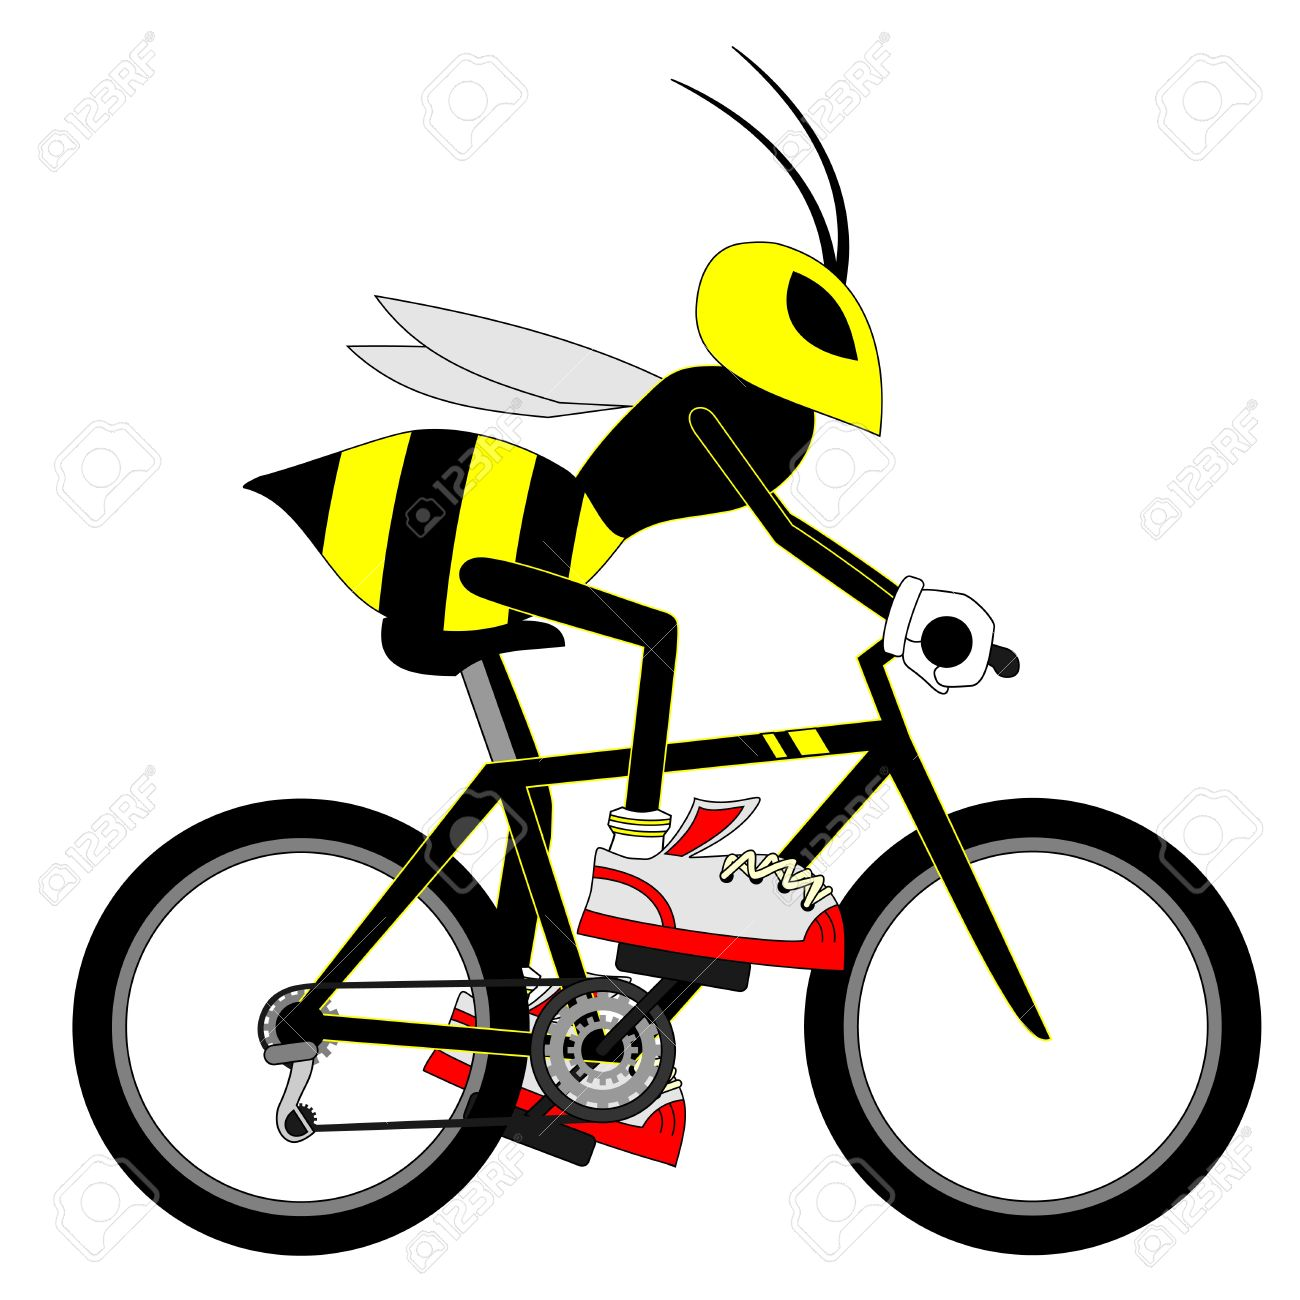 Wasp bike Stock Vector - 17265258